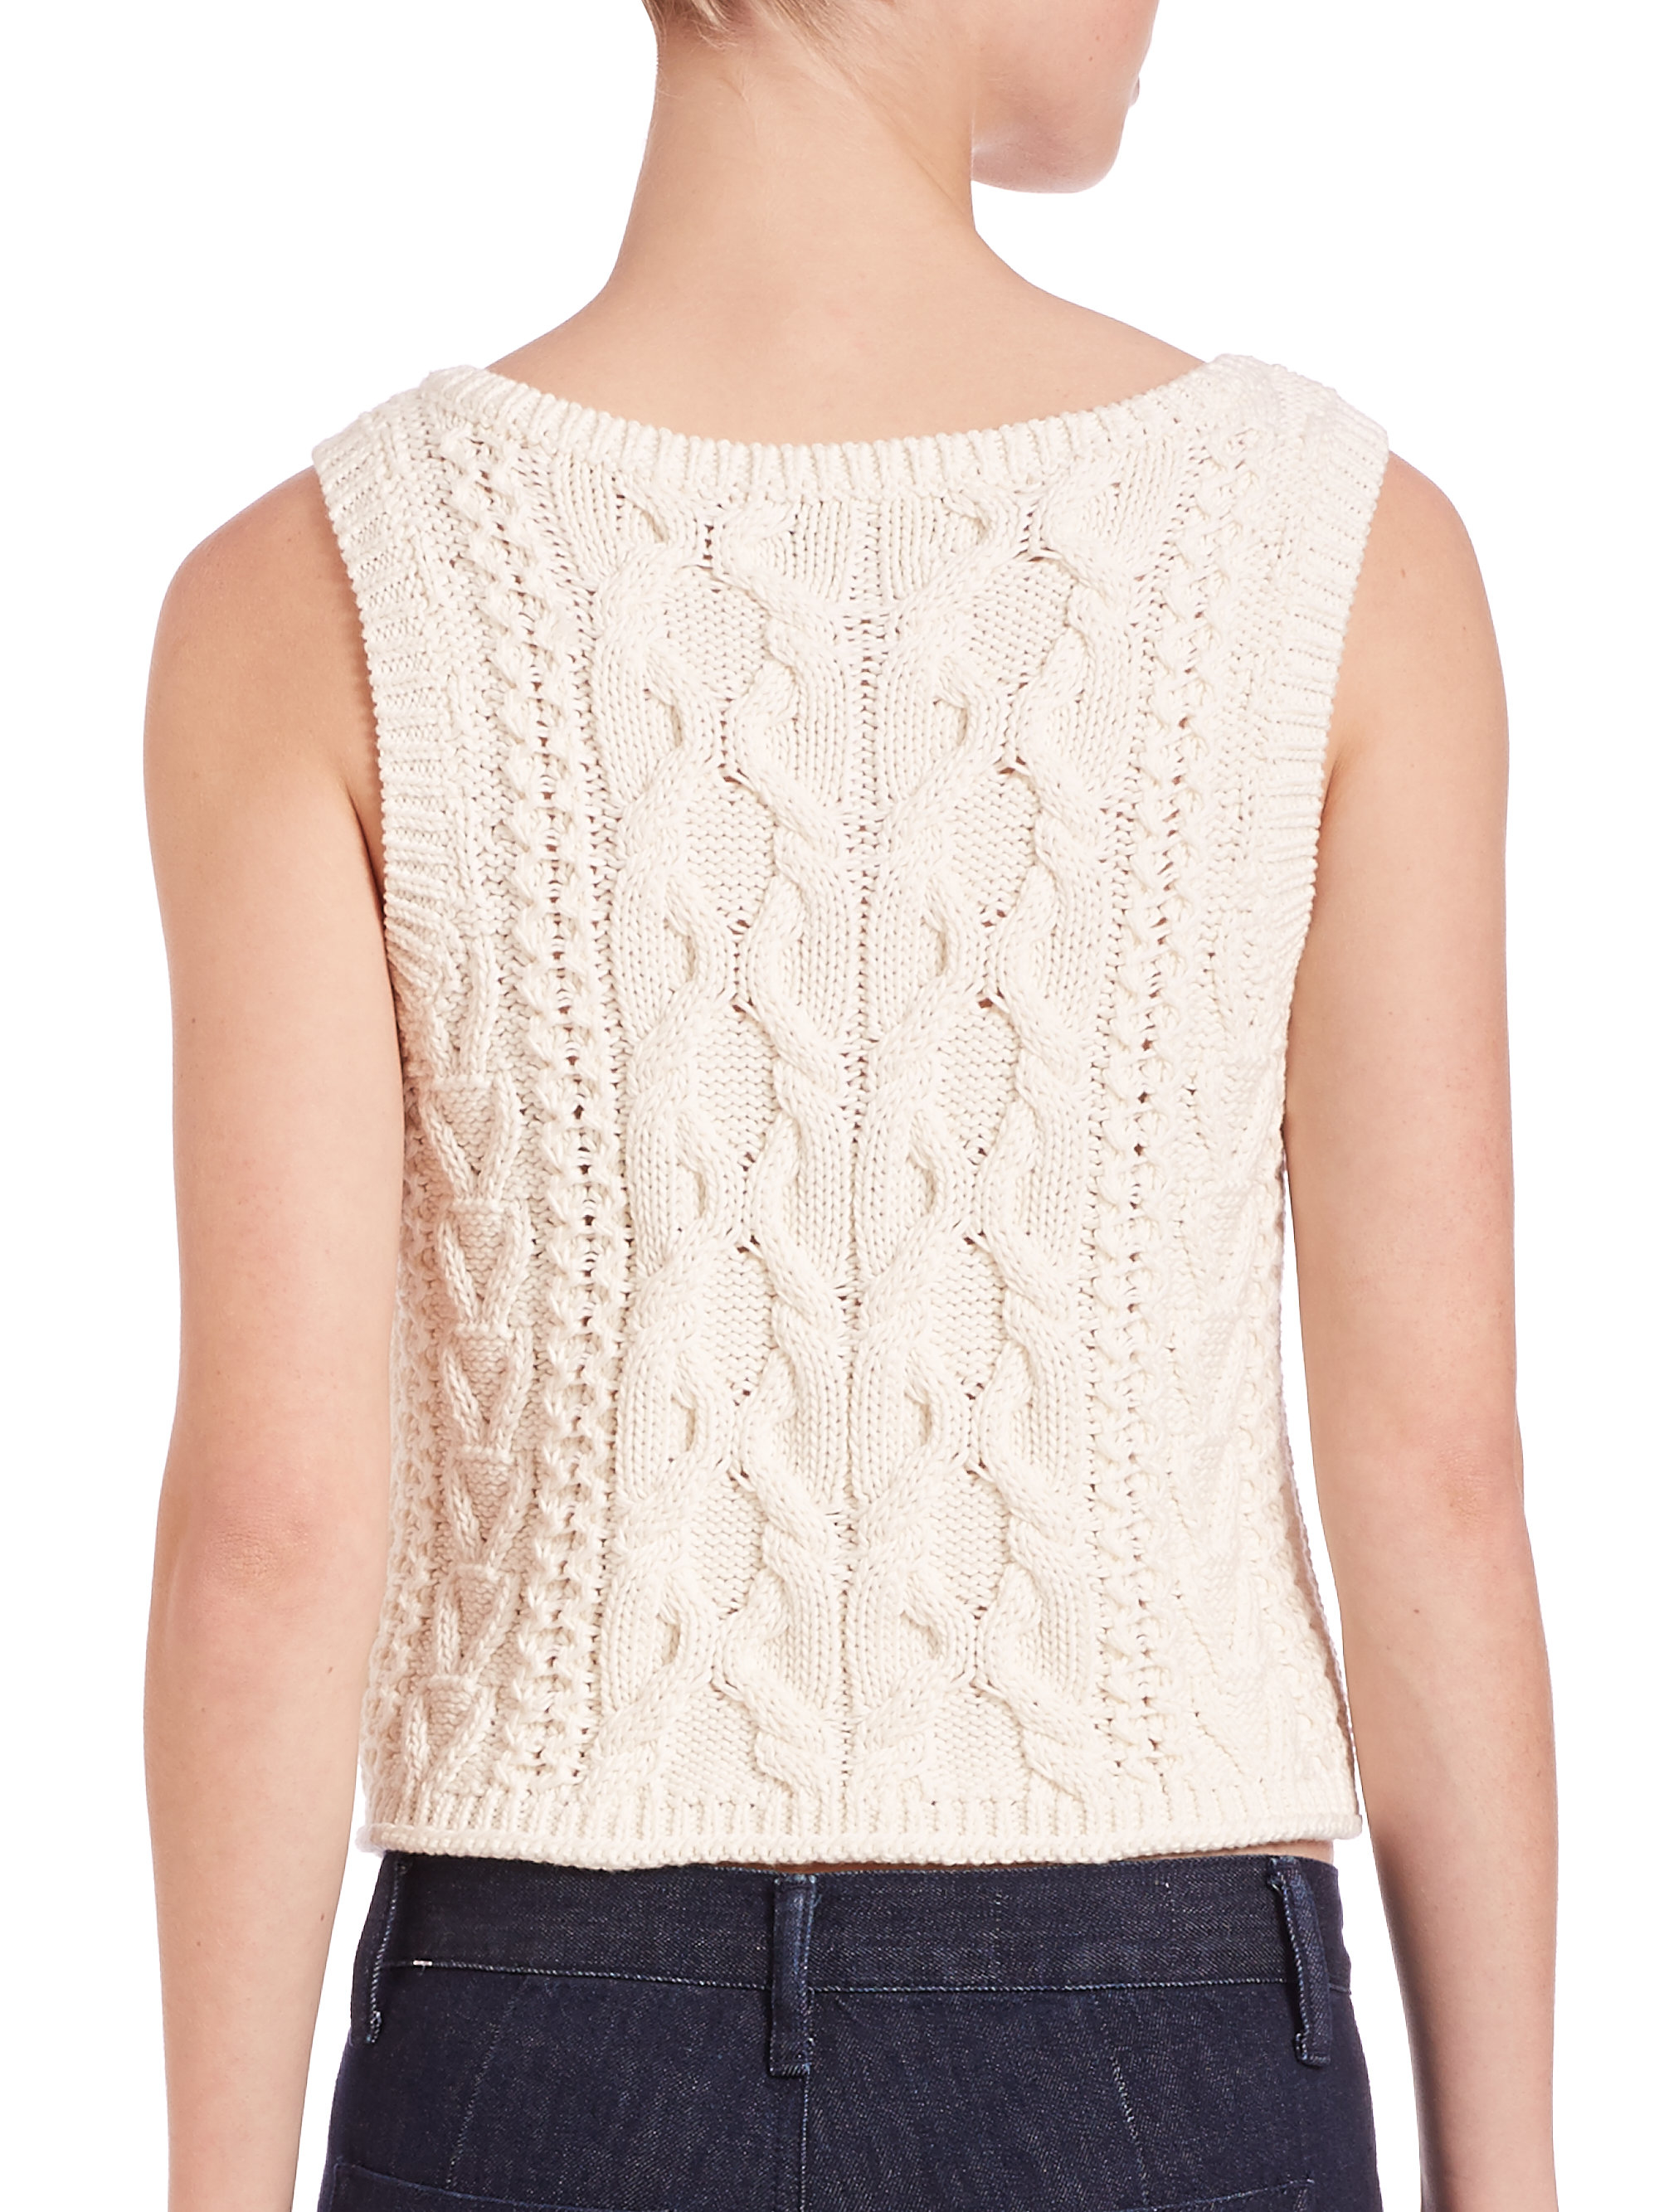 Polo Ralph Lauren Women S Natural Cotton Cable Knit Sweater